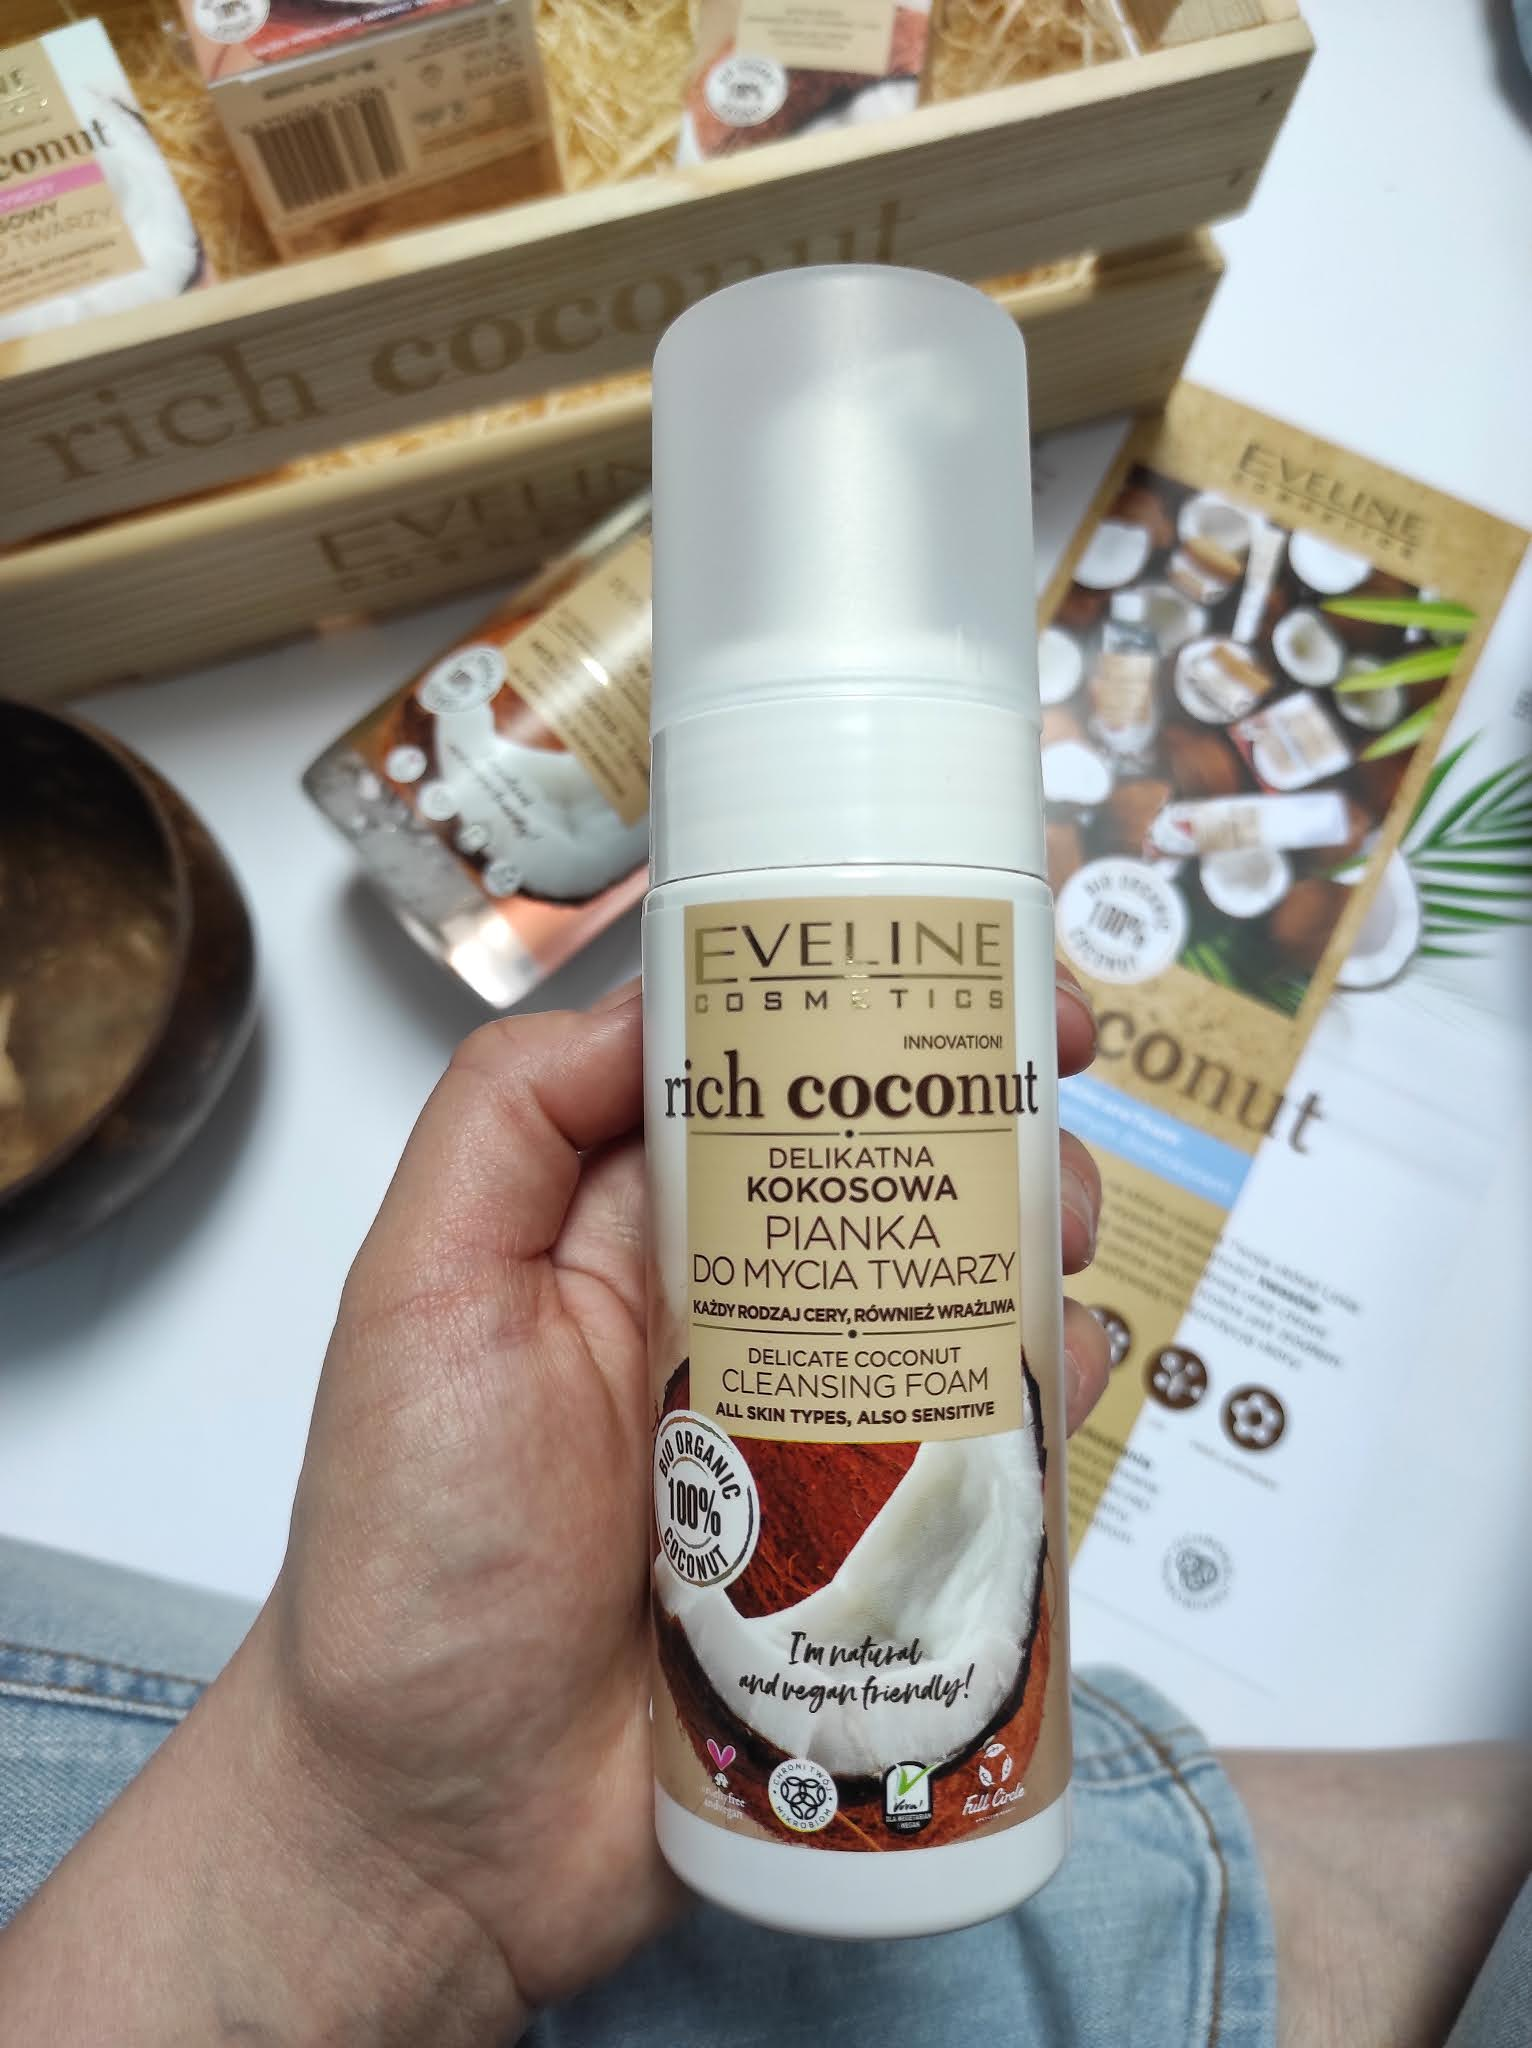 Rich  coconut Eveline Cosmetics